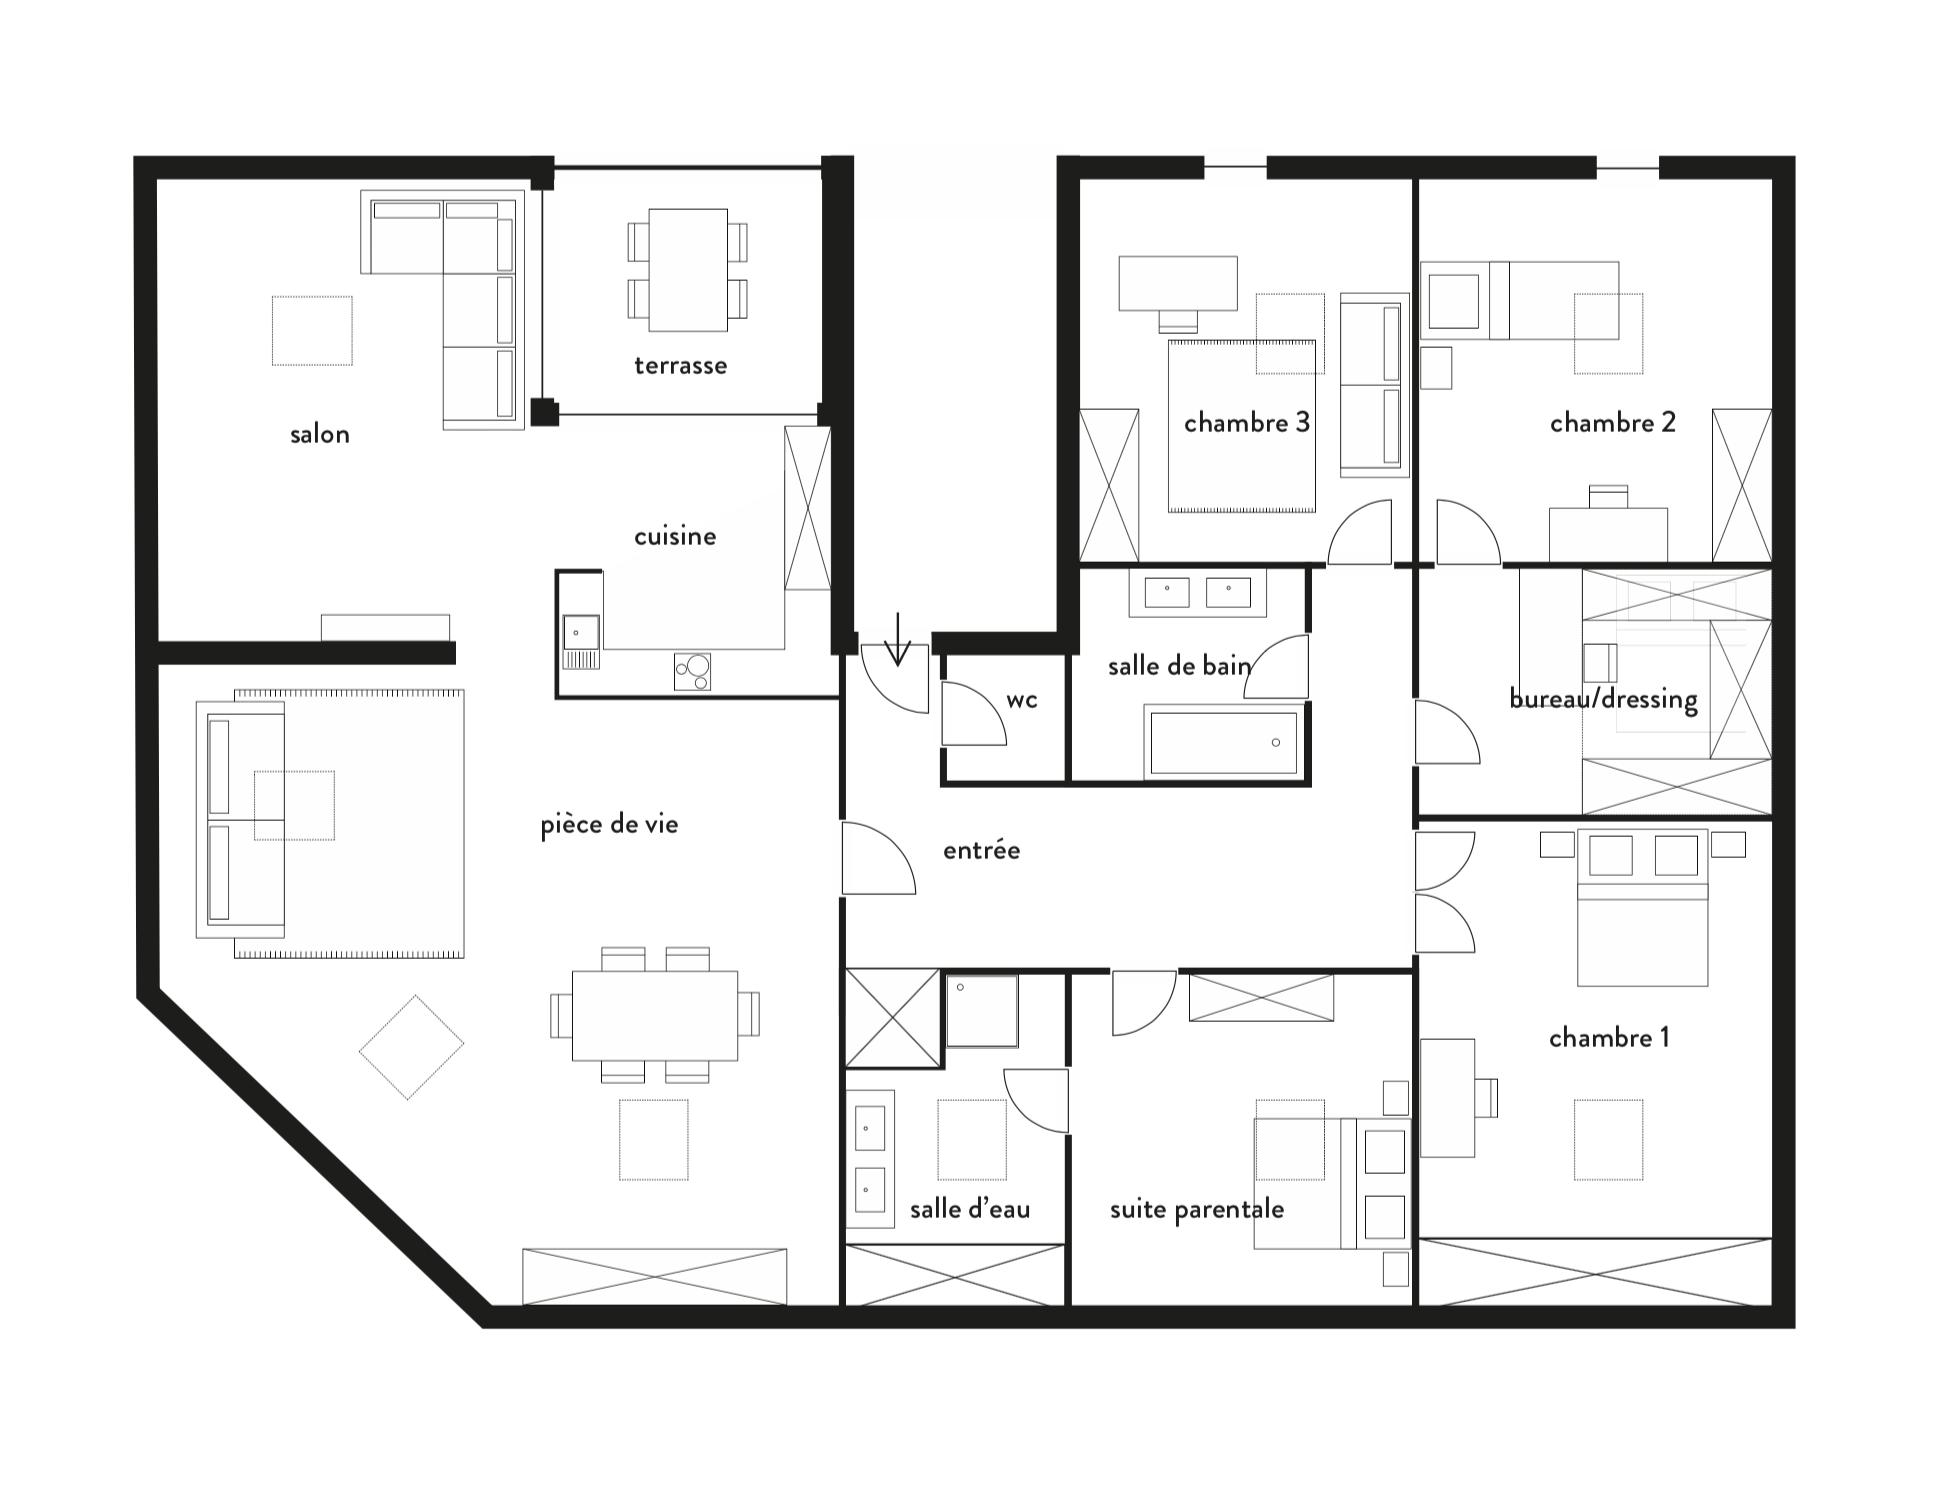 bumper-blog-news-immobilier-lyon-appartement-vente-achat-investir-homestaging-design-decoration-lifestyle-art-.png